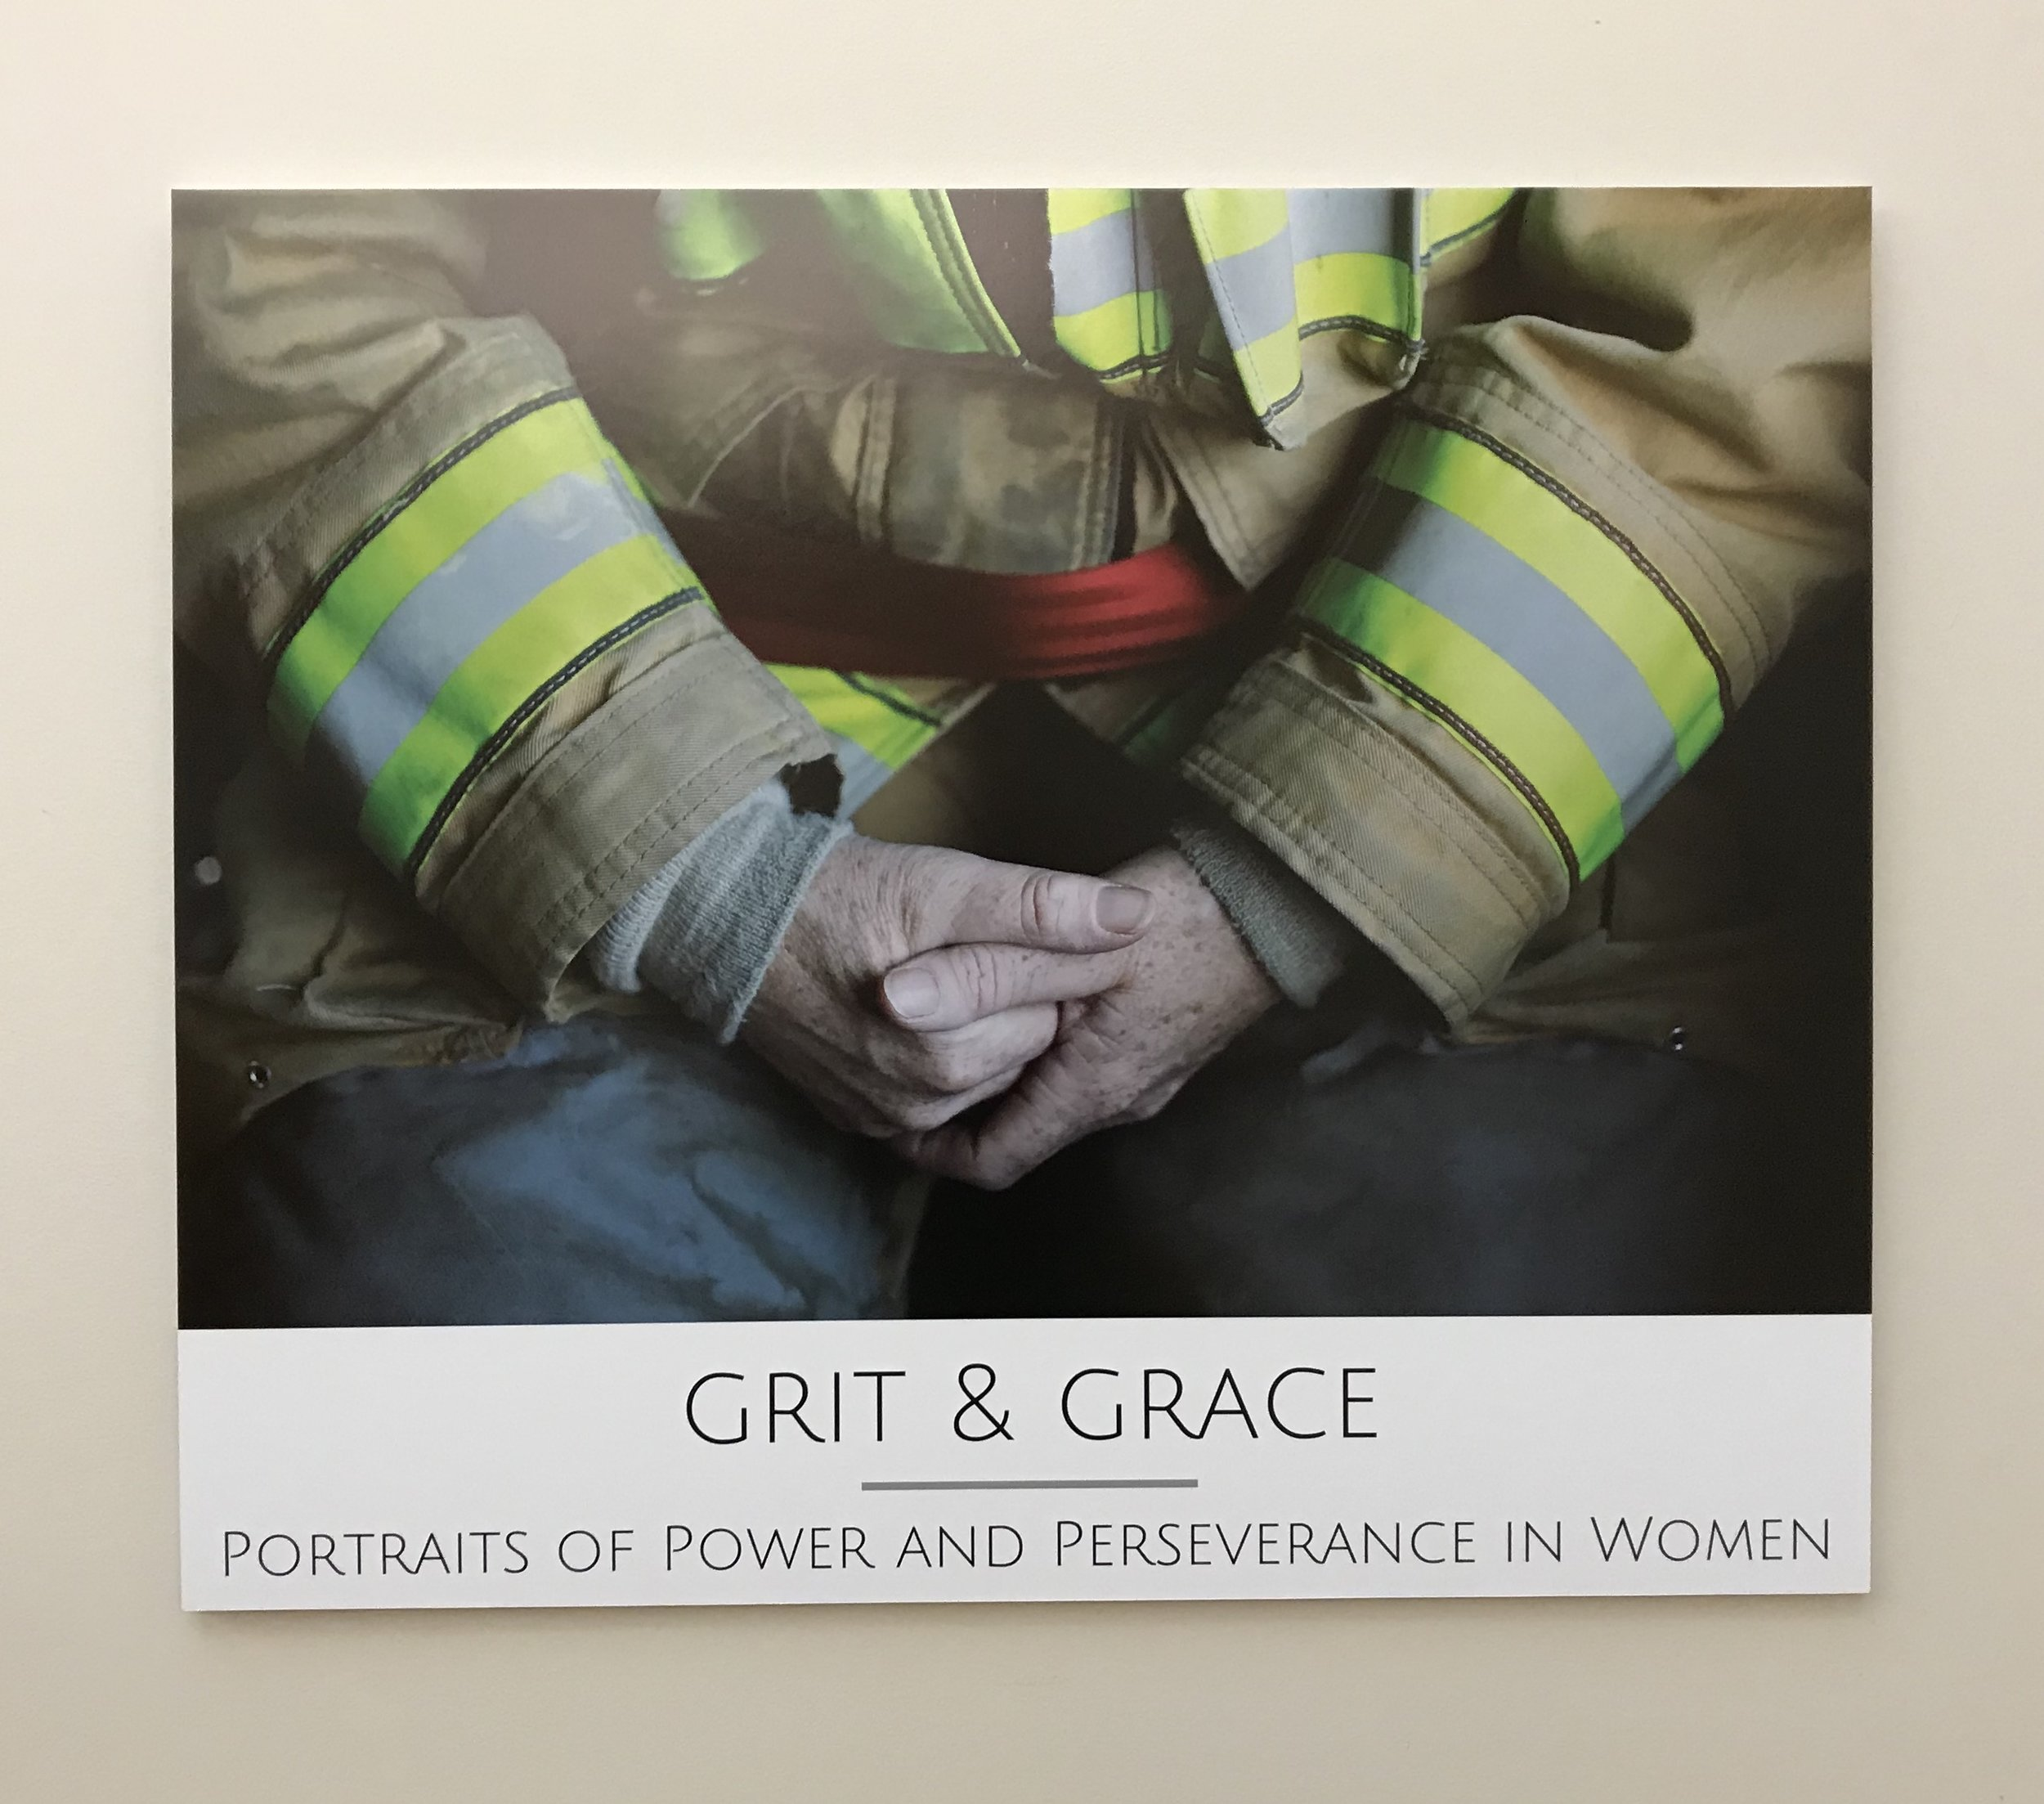 The Grit & Grace Exhibit at the Hamilton-Wenham Library